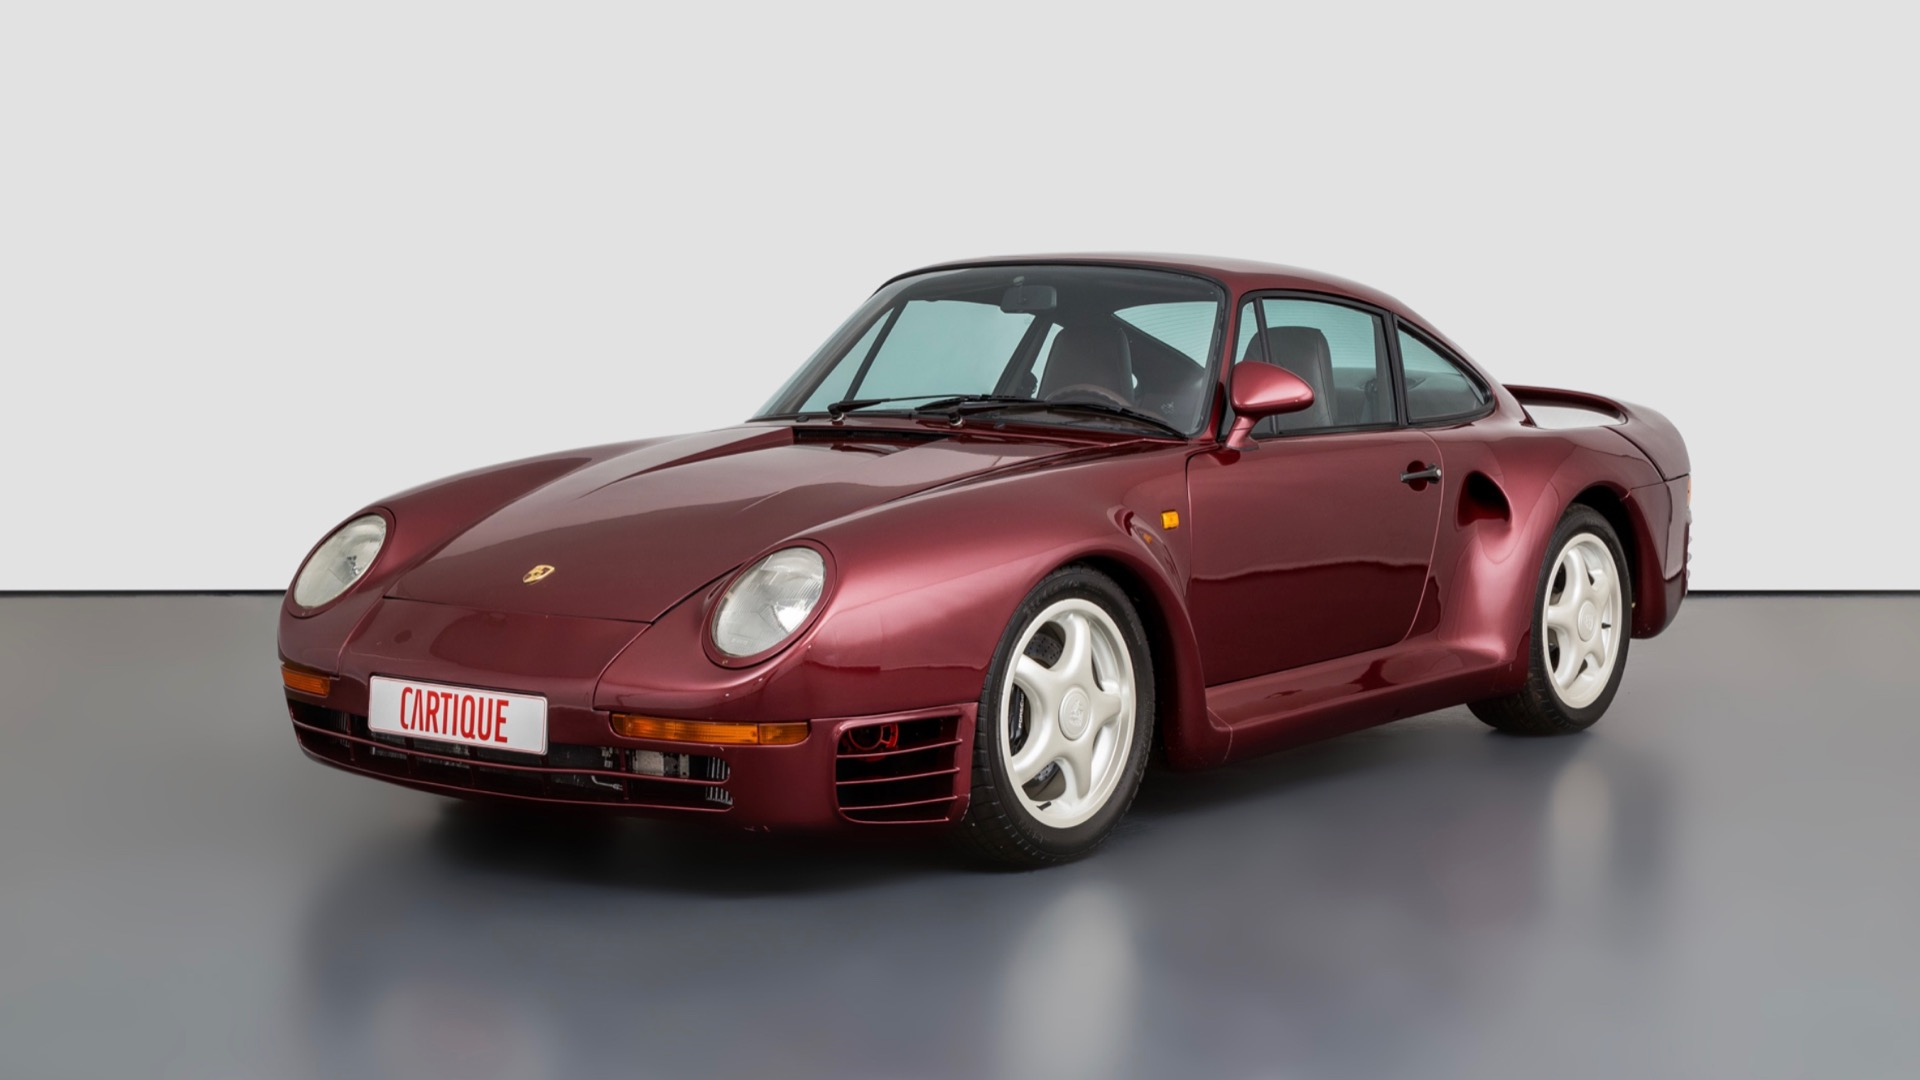 Rare Porsche 959 prototype for sale in Germany